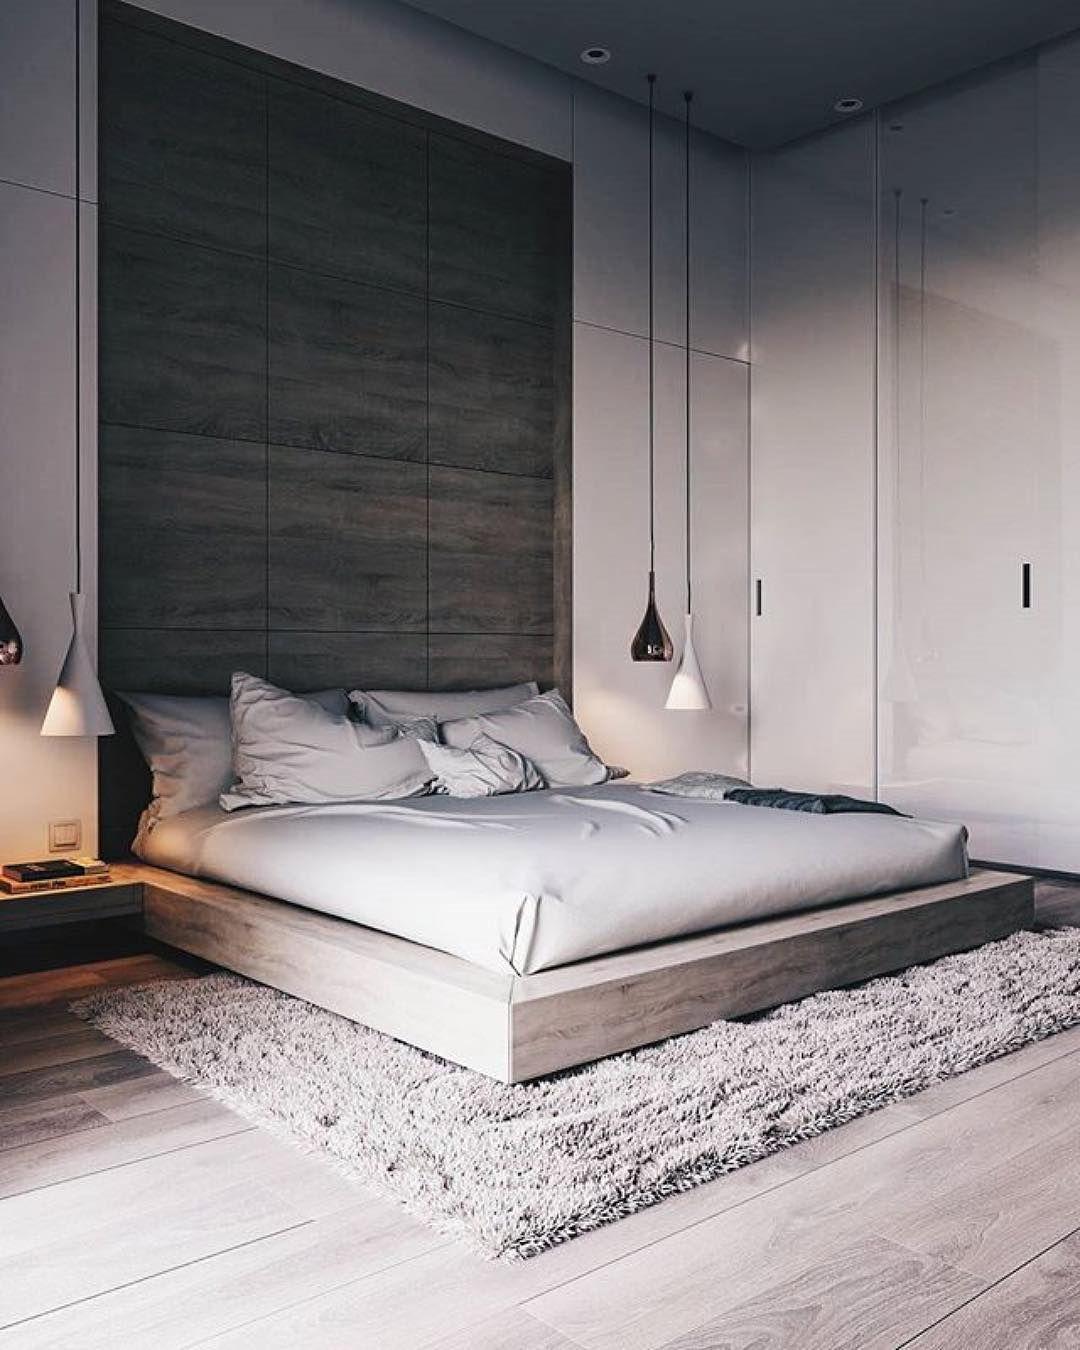 17 Best Inspiration Industrial Interior Design Ideas For Your Home Decor Stylish Bedroom Home Decor Bedroom Modern Master Bedroom